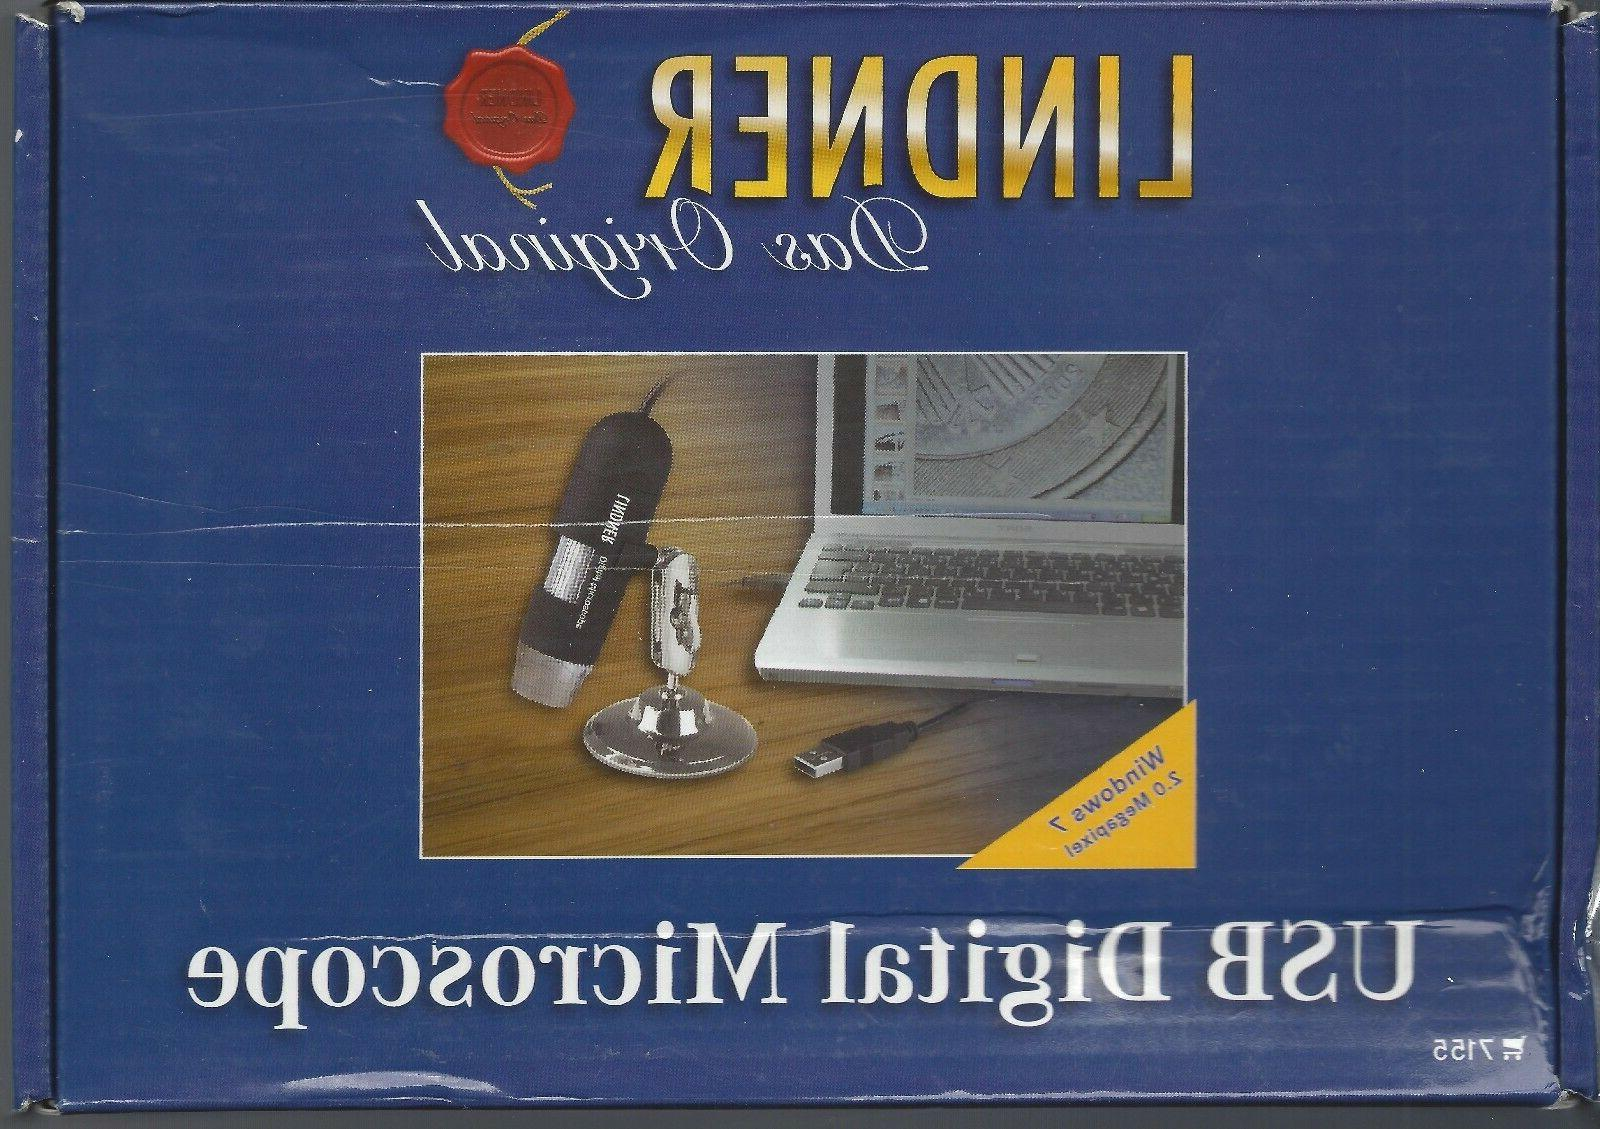 7155 usb 2 0 digital microscope